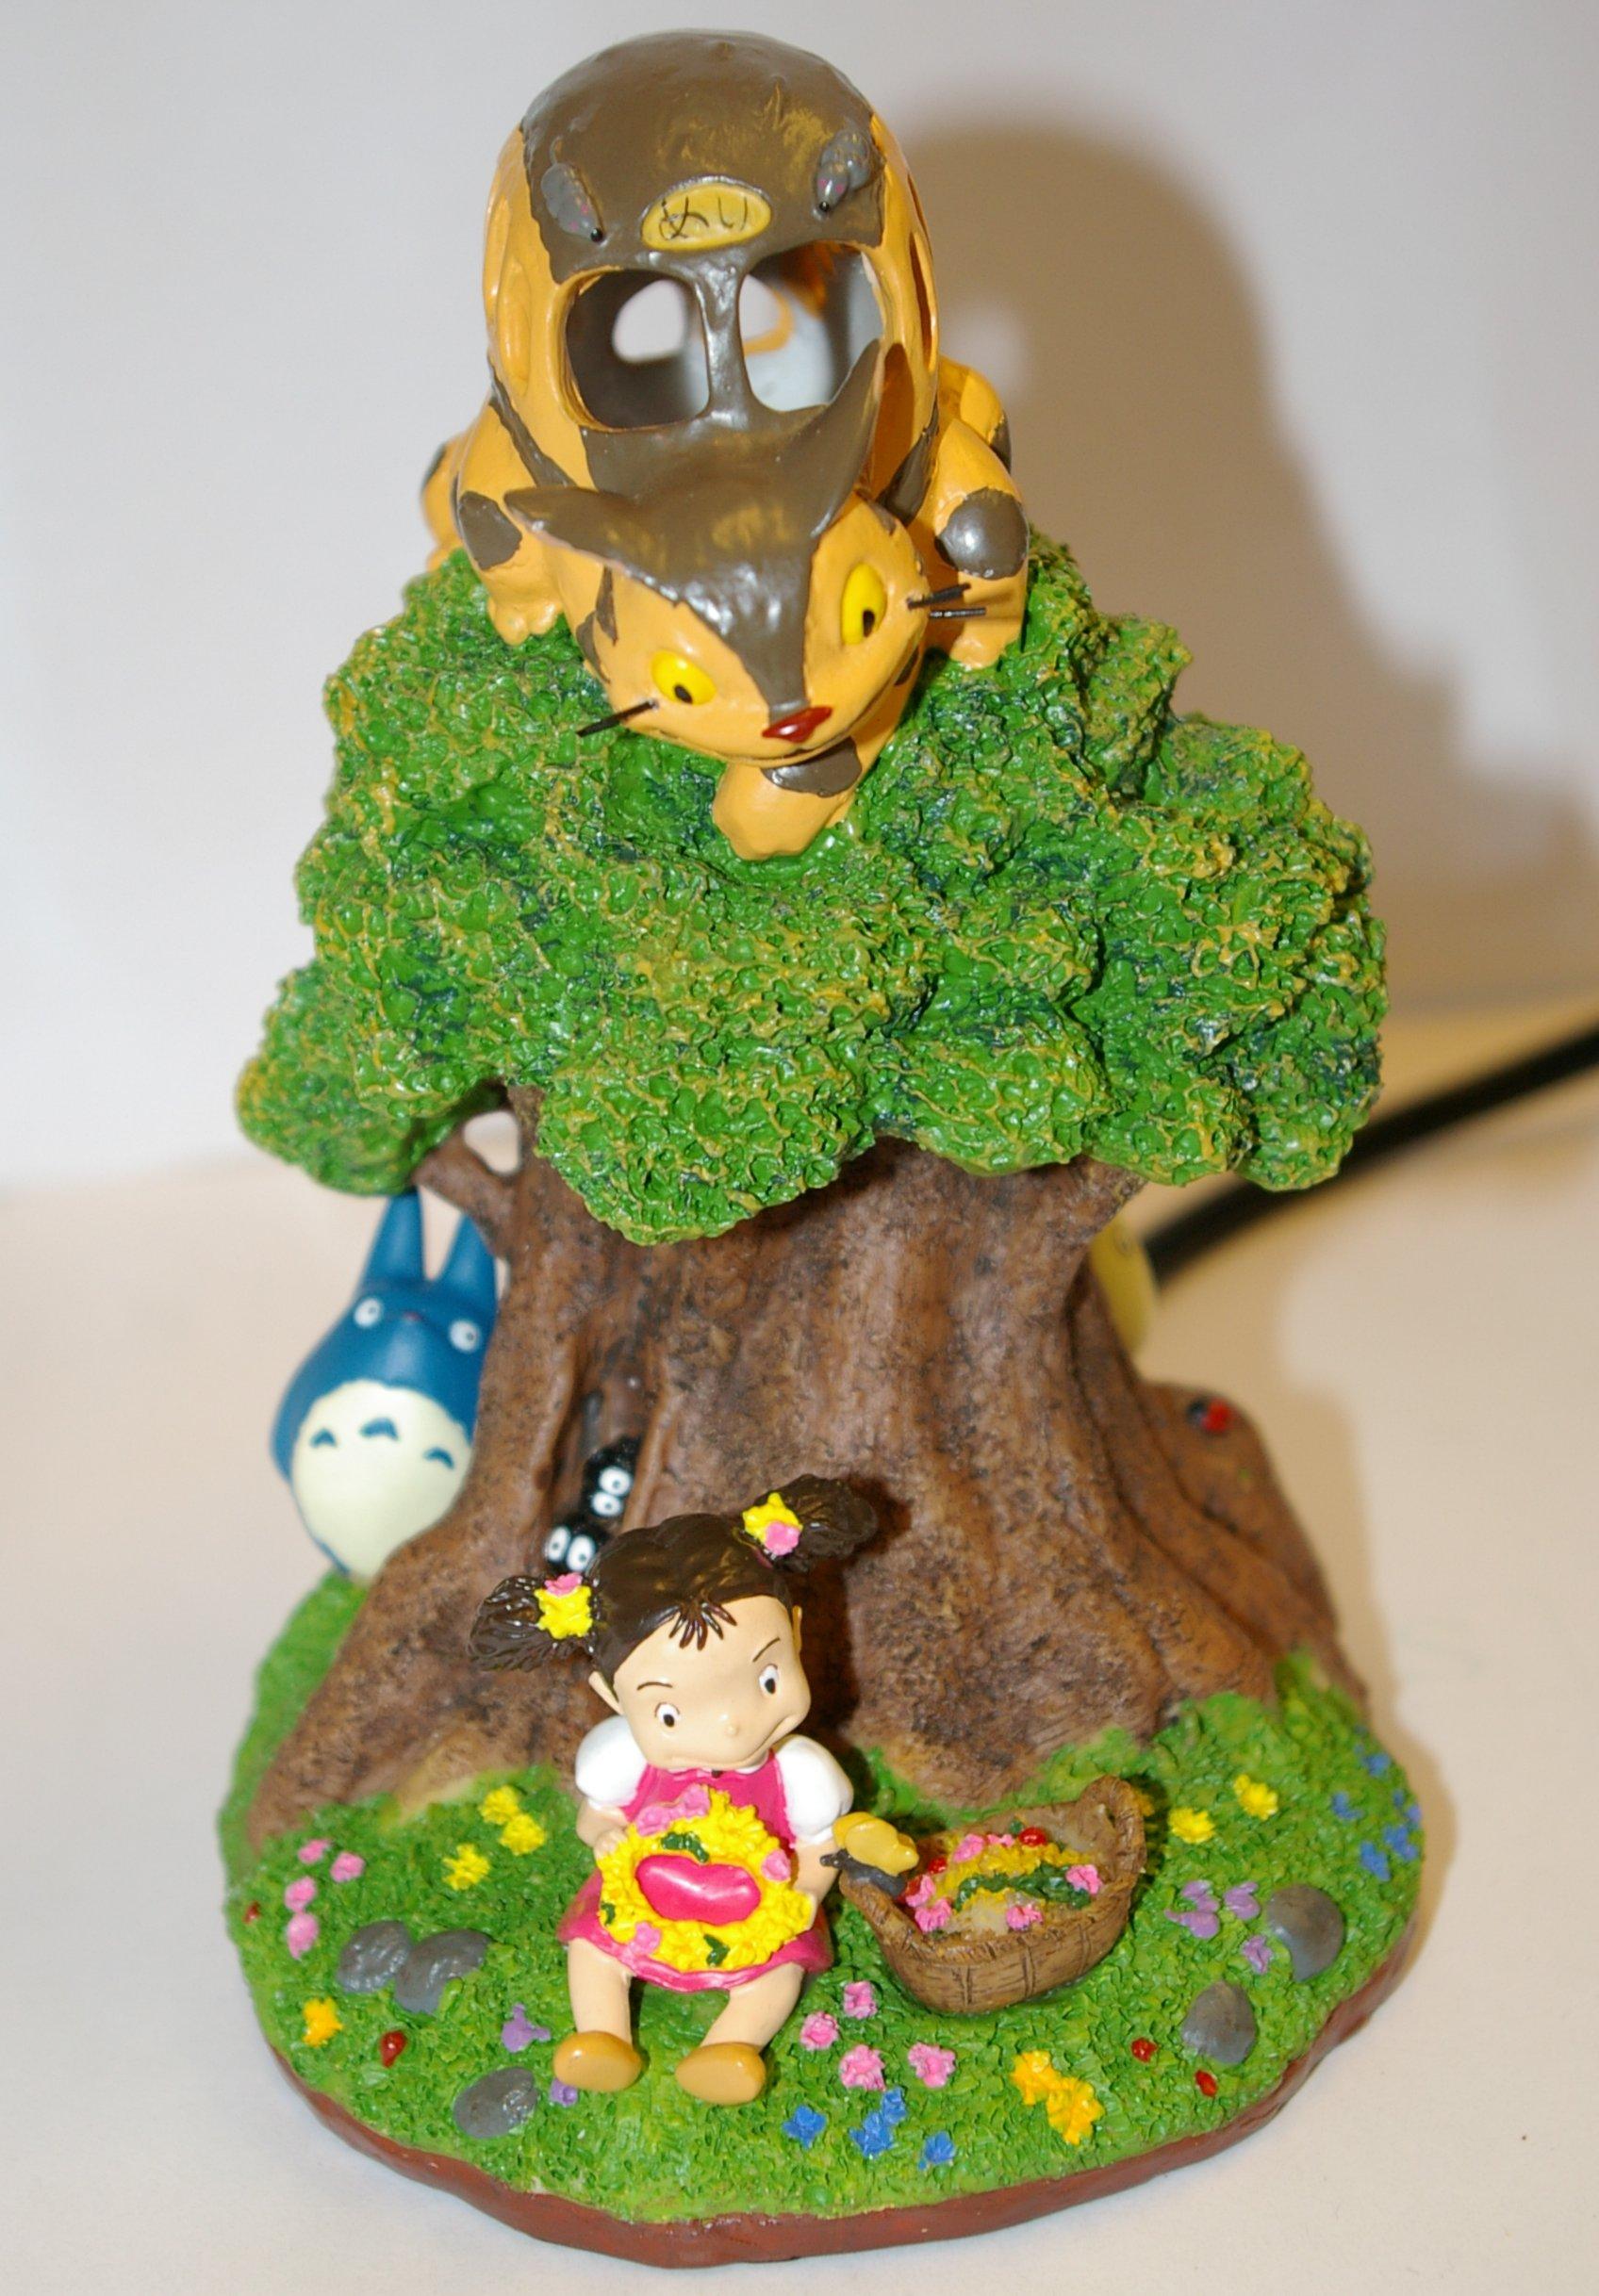 Face de la lampe de chevet Totoro